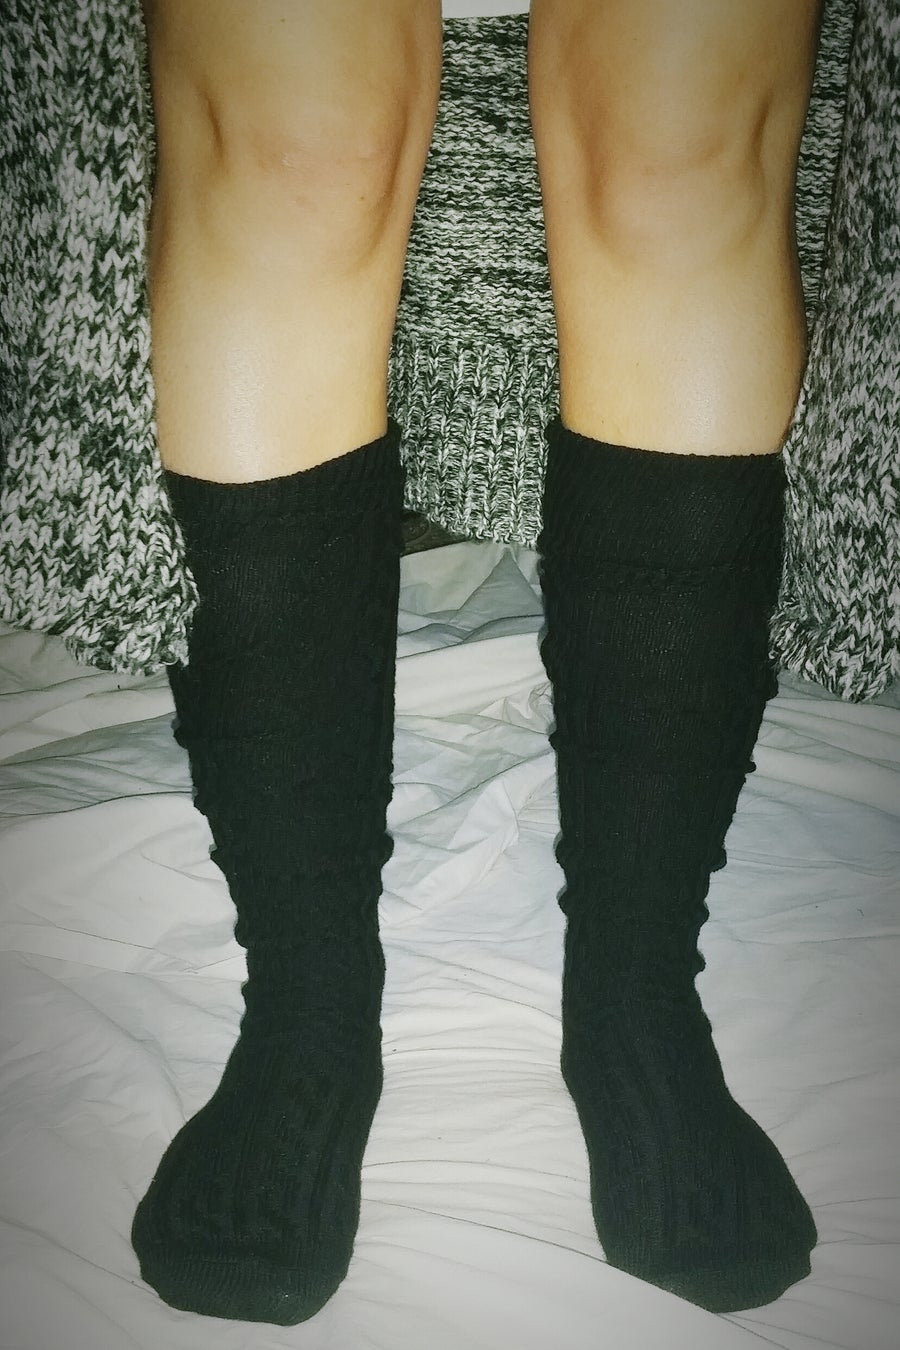 Image of Sleepy socks